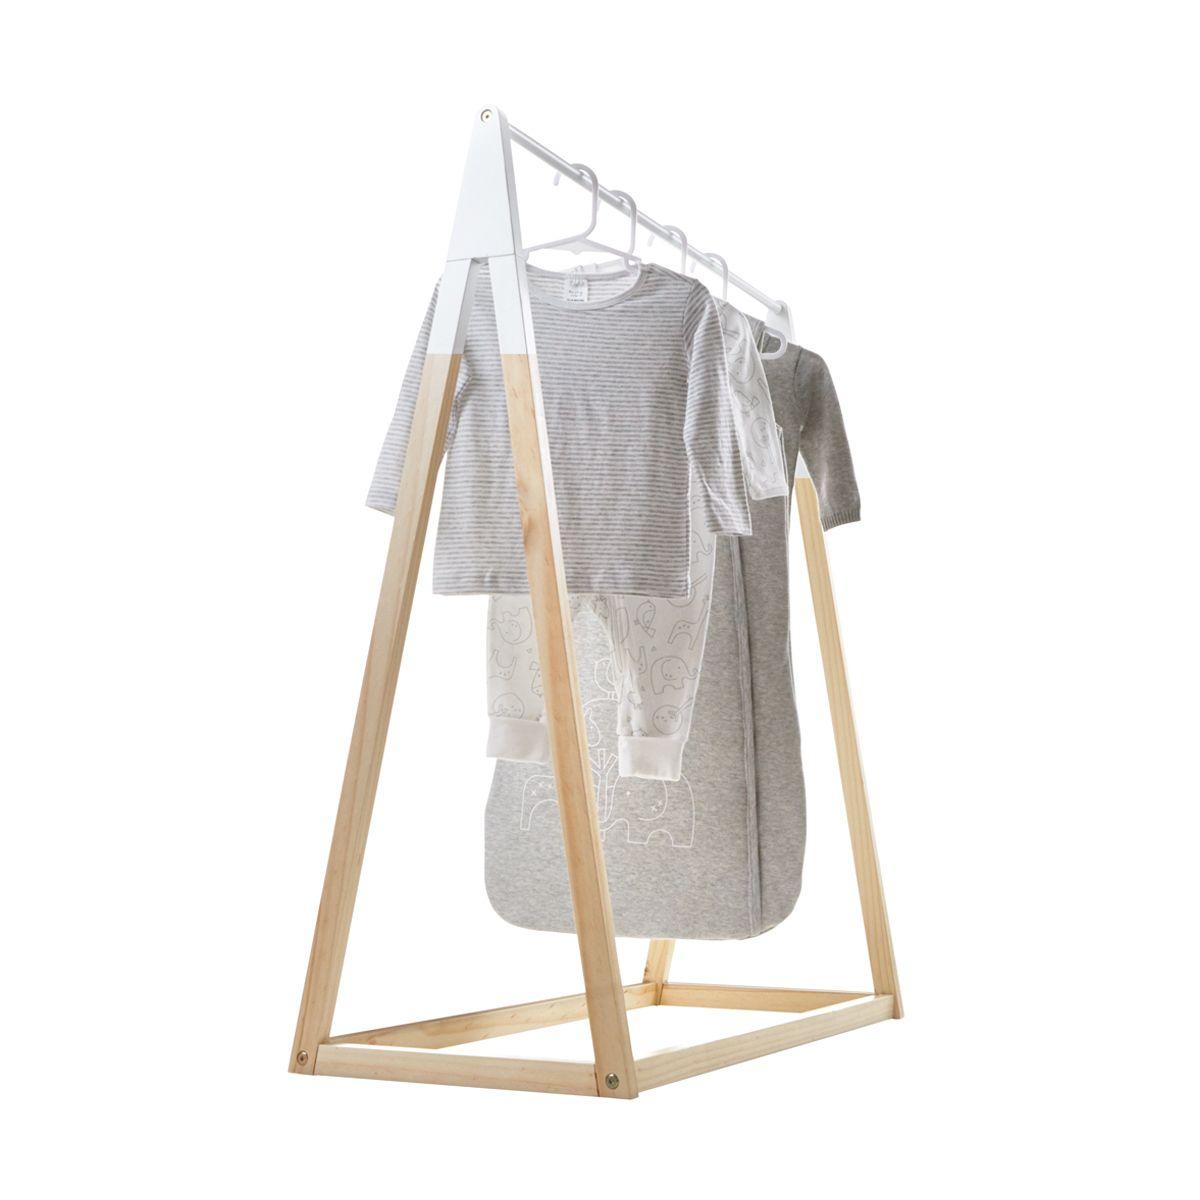 Diy Child Clothes Rack: Nursery Clothes Rack